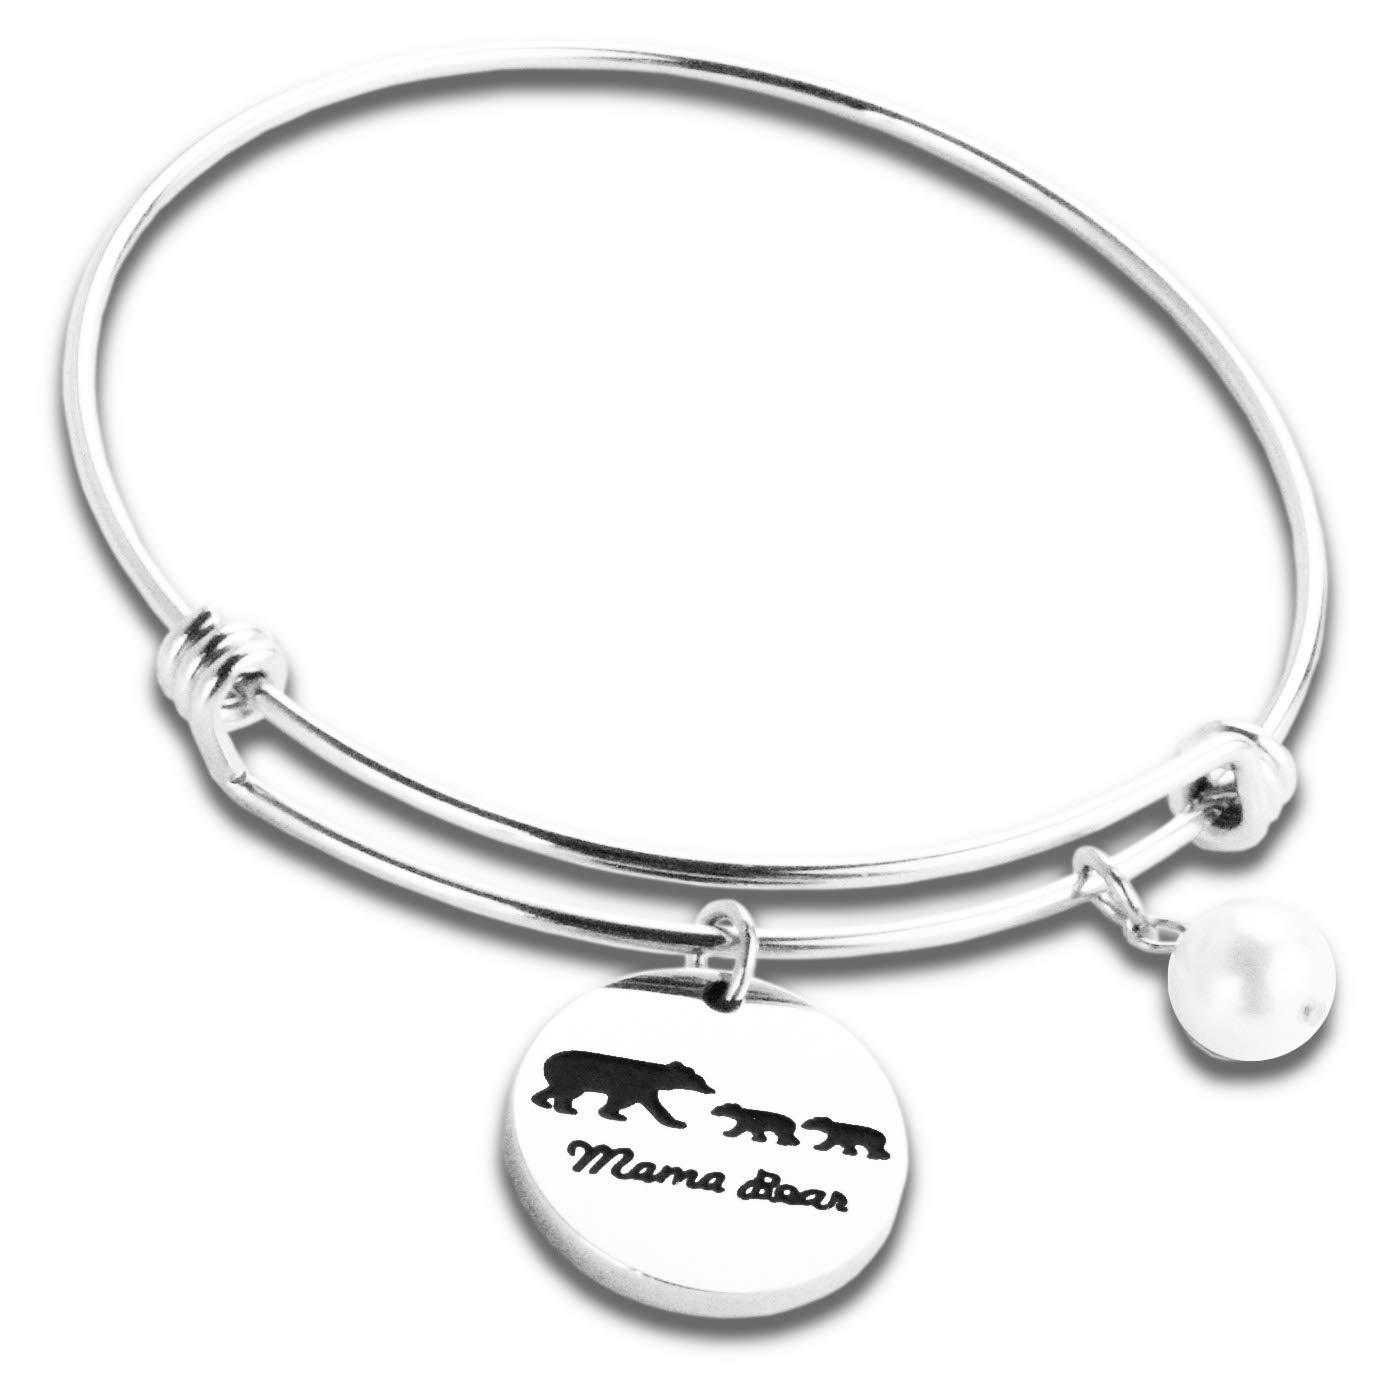 6f0f8ef9e Mother Bear Bracelet Mother's Day Bracelet Mama Bear Bangle Bracelet with 1  Cub Adjustable with Charm Engraved Baby Bear